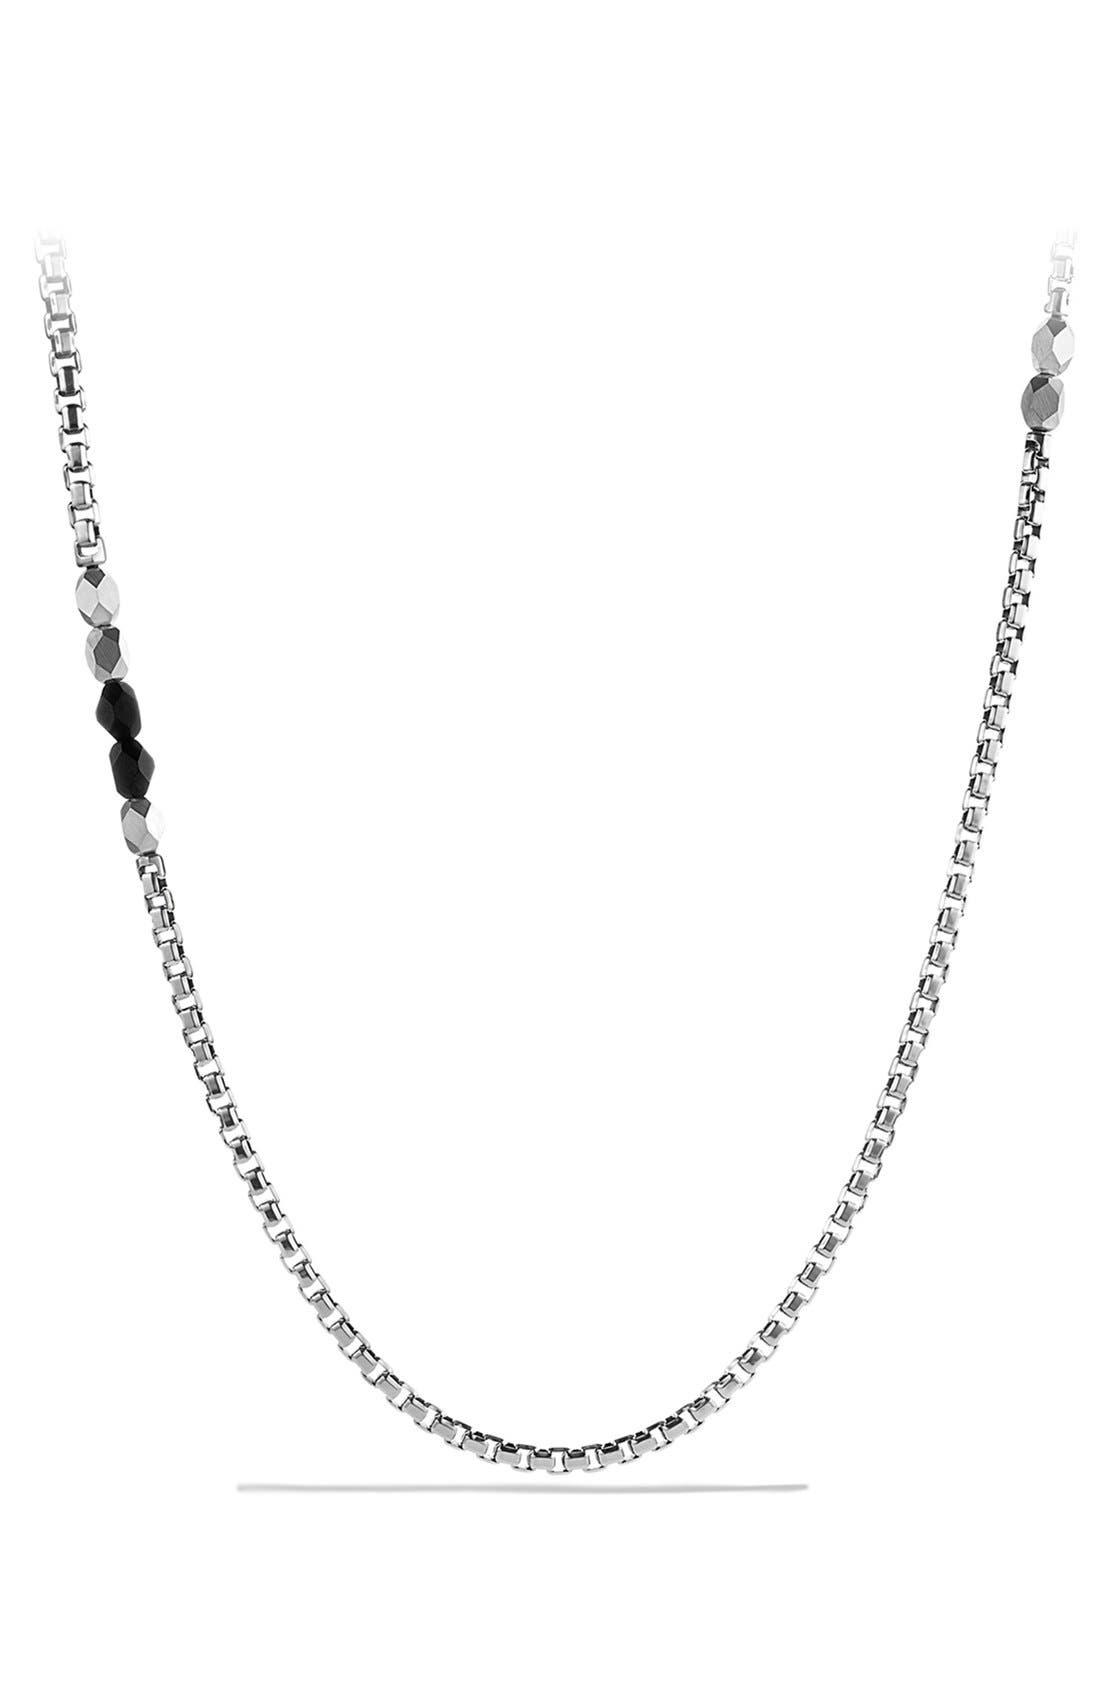 Main Image - David Yurman 'Faceted' Metal Necklace